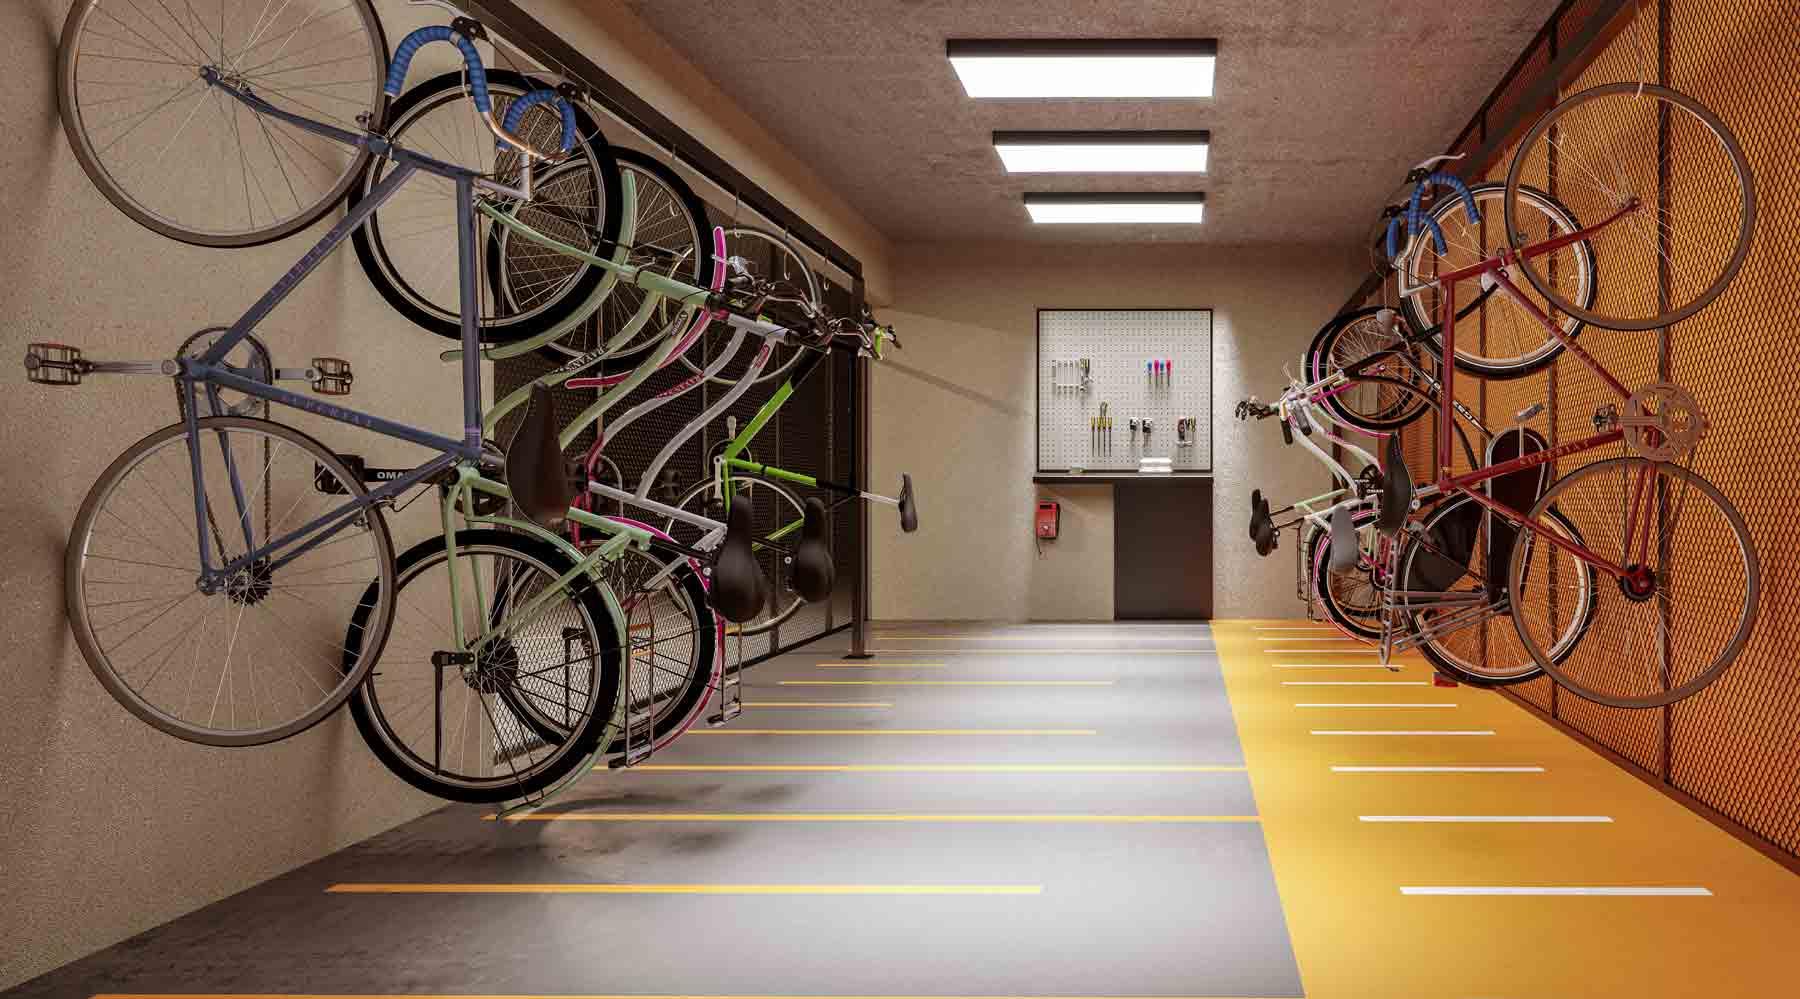 Bicicletário – Perspectiva Ilustrada